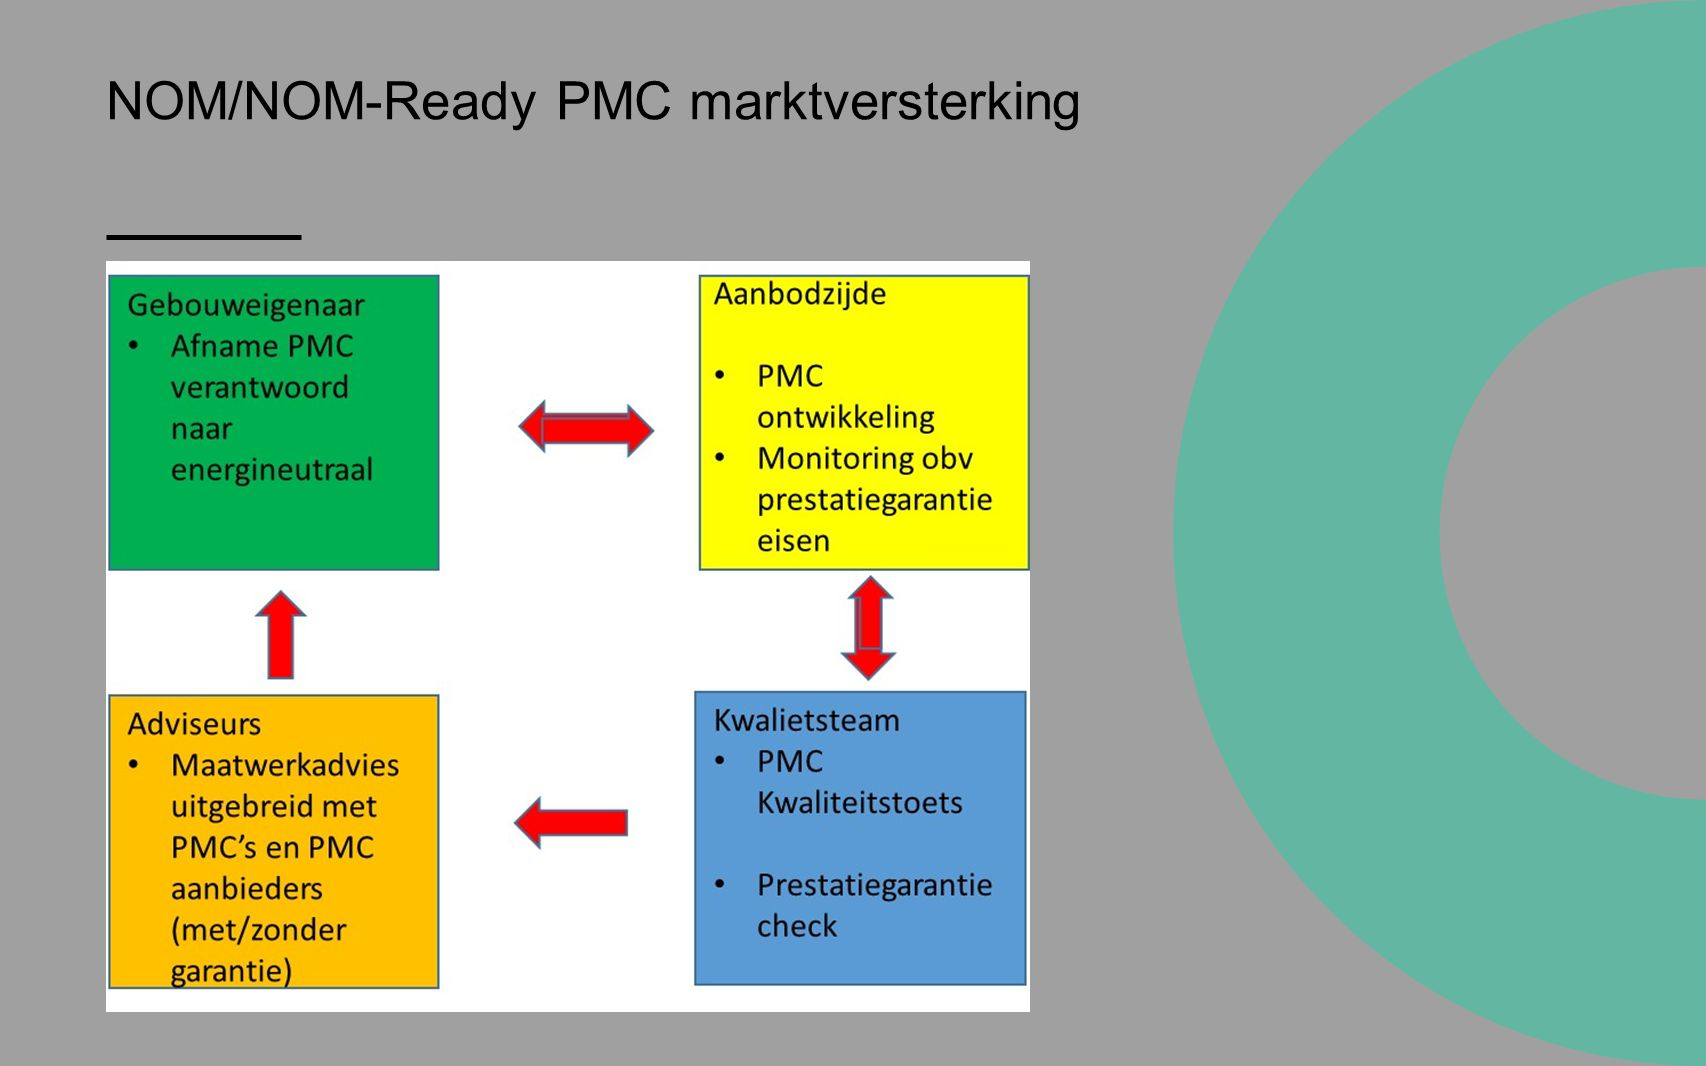 NOM/NOM-Ready PMC marktversterking